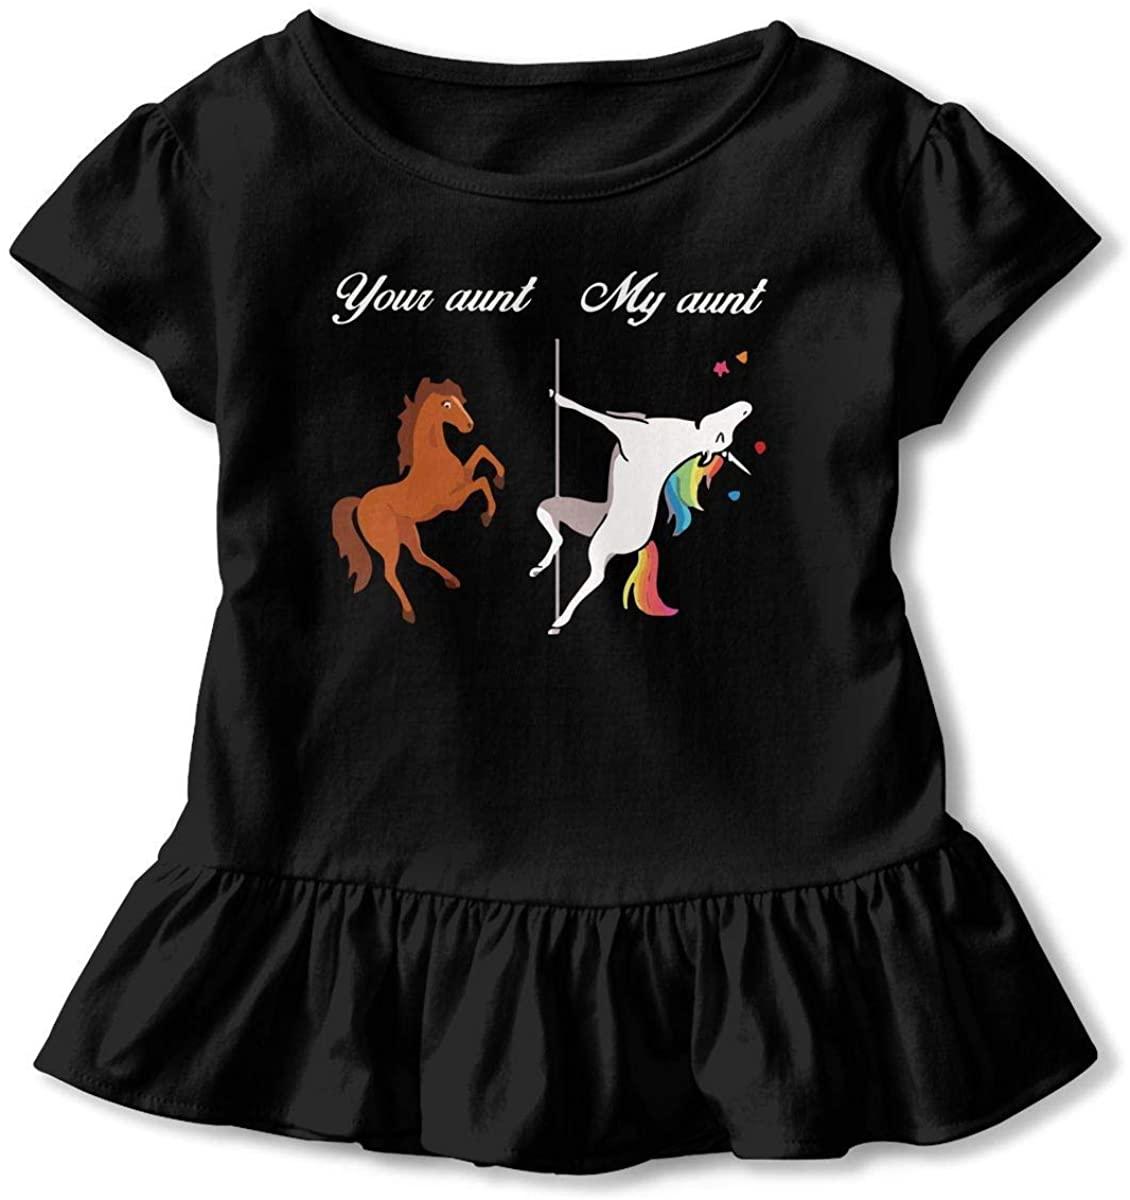 SDHEIJKY Unicorn Your Aunt My Aunt Funny Toddler Baby Girls' Short Sleeve Ruffle T-Shirt